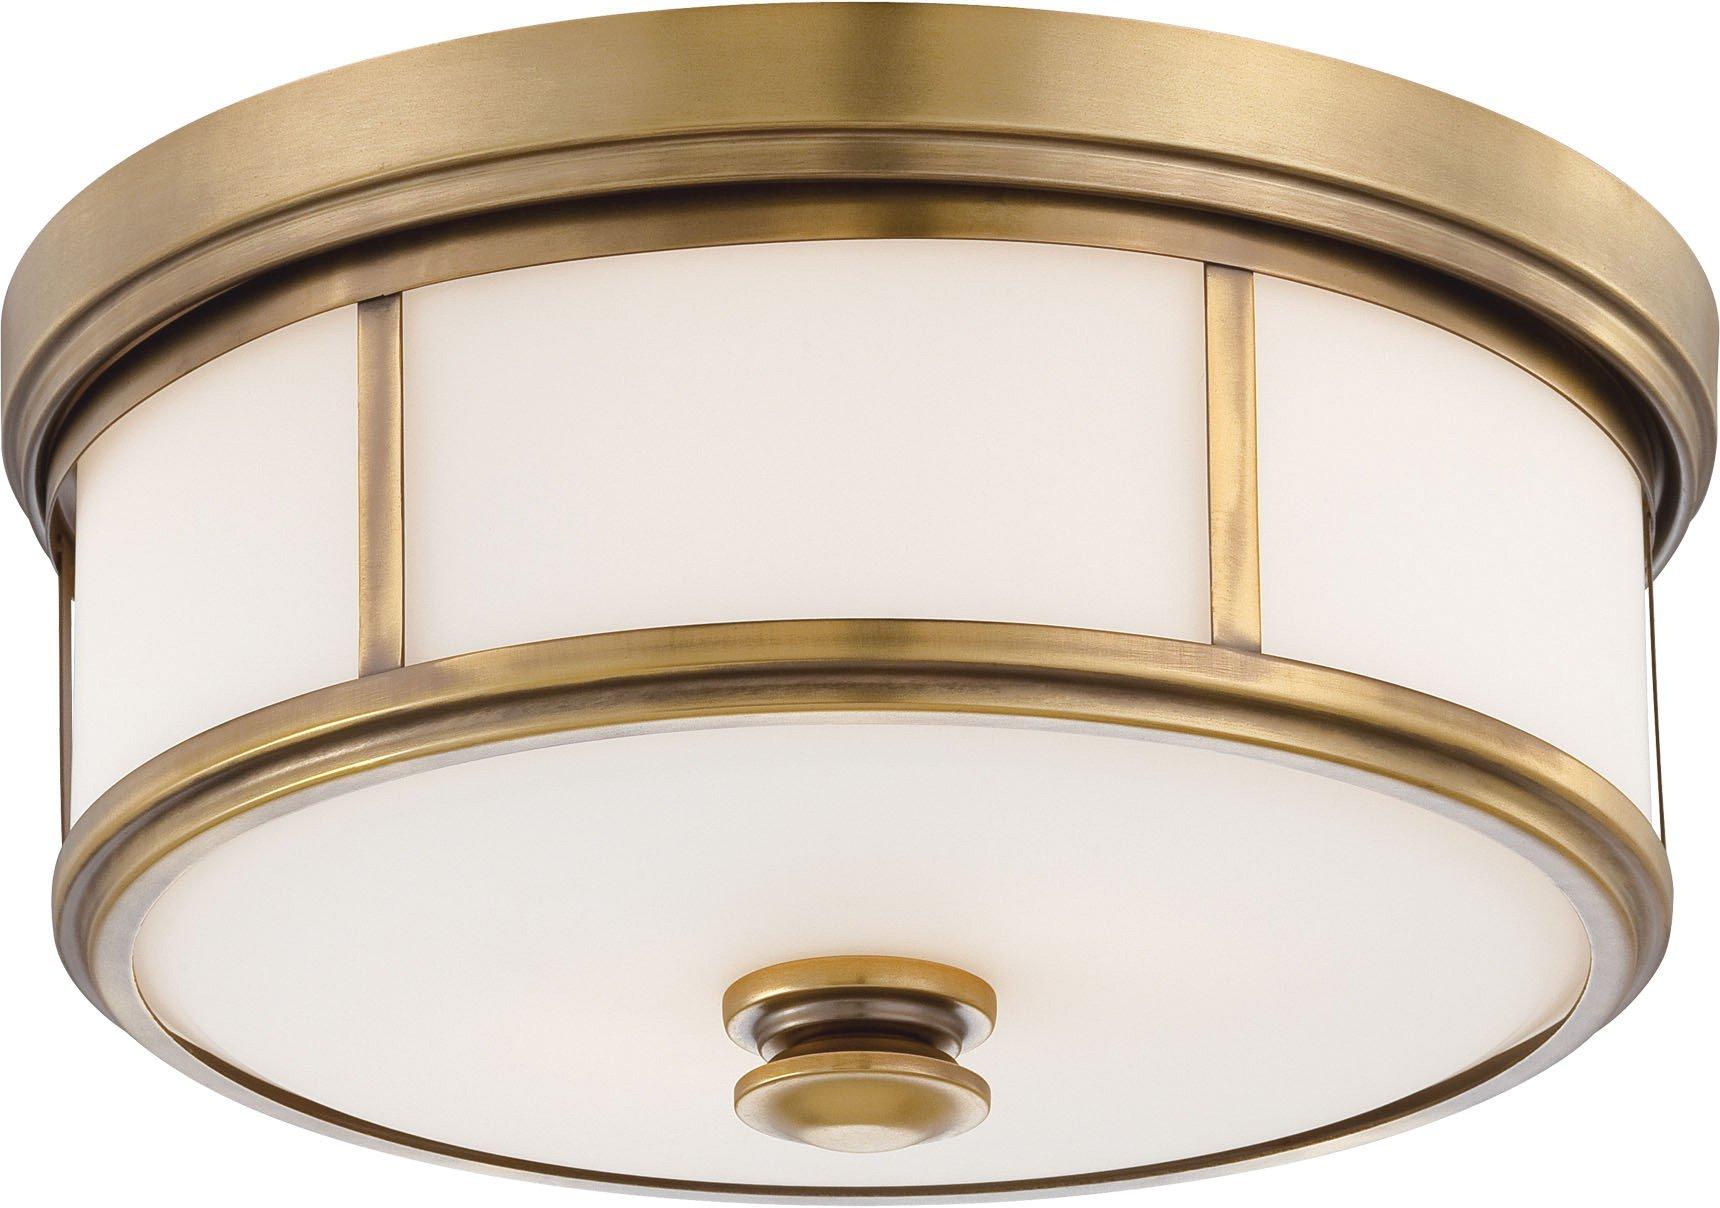 Minka Lavery Harbour Point 4365-249 2 Light 120 watt (6''H x 13''W) Glass Flush Mountin Brass